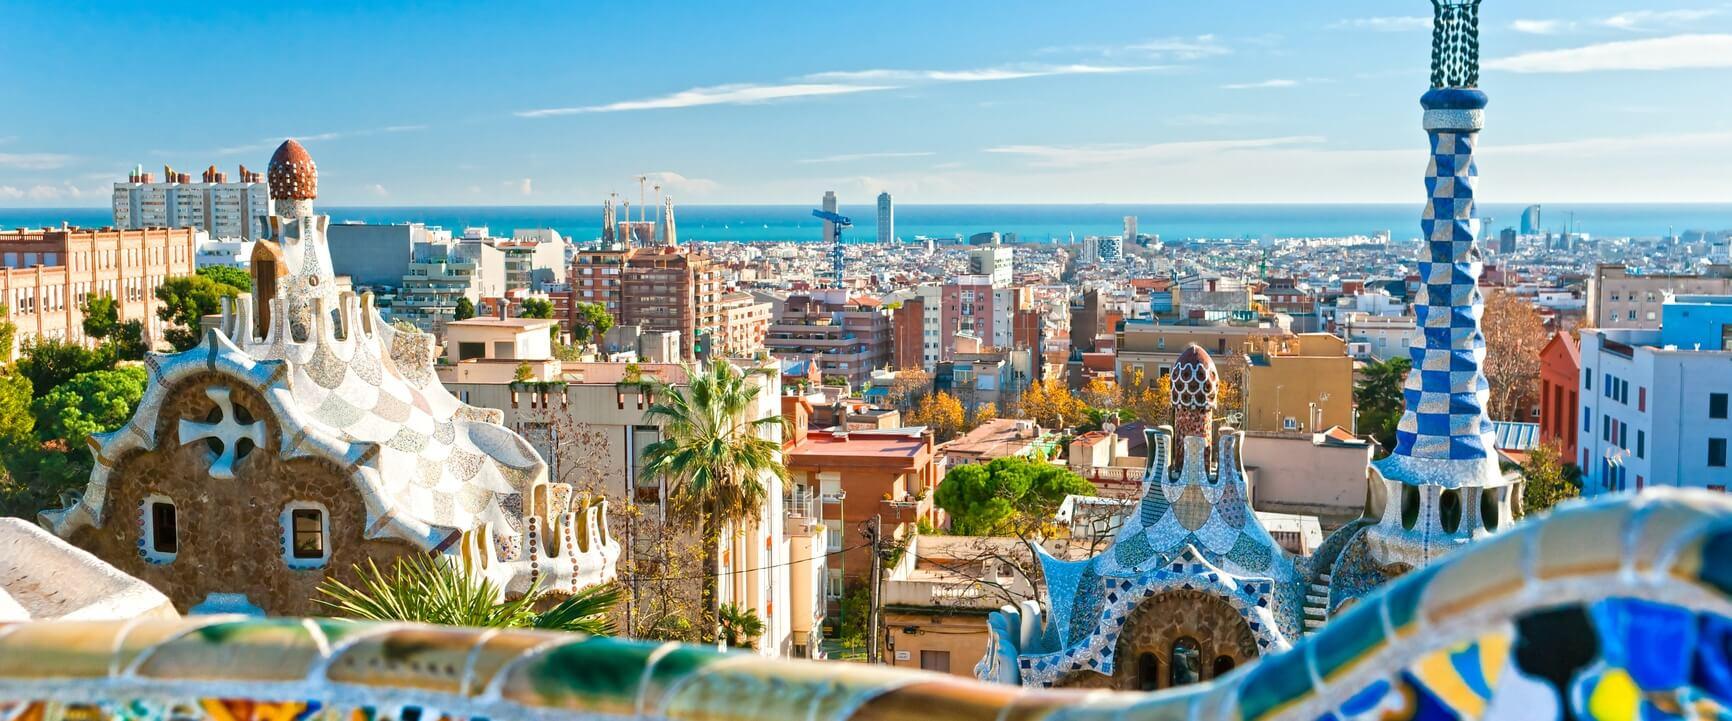 tanulj spanyolul Barcelonában!@